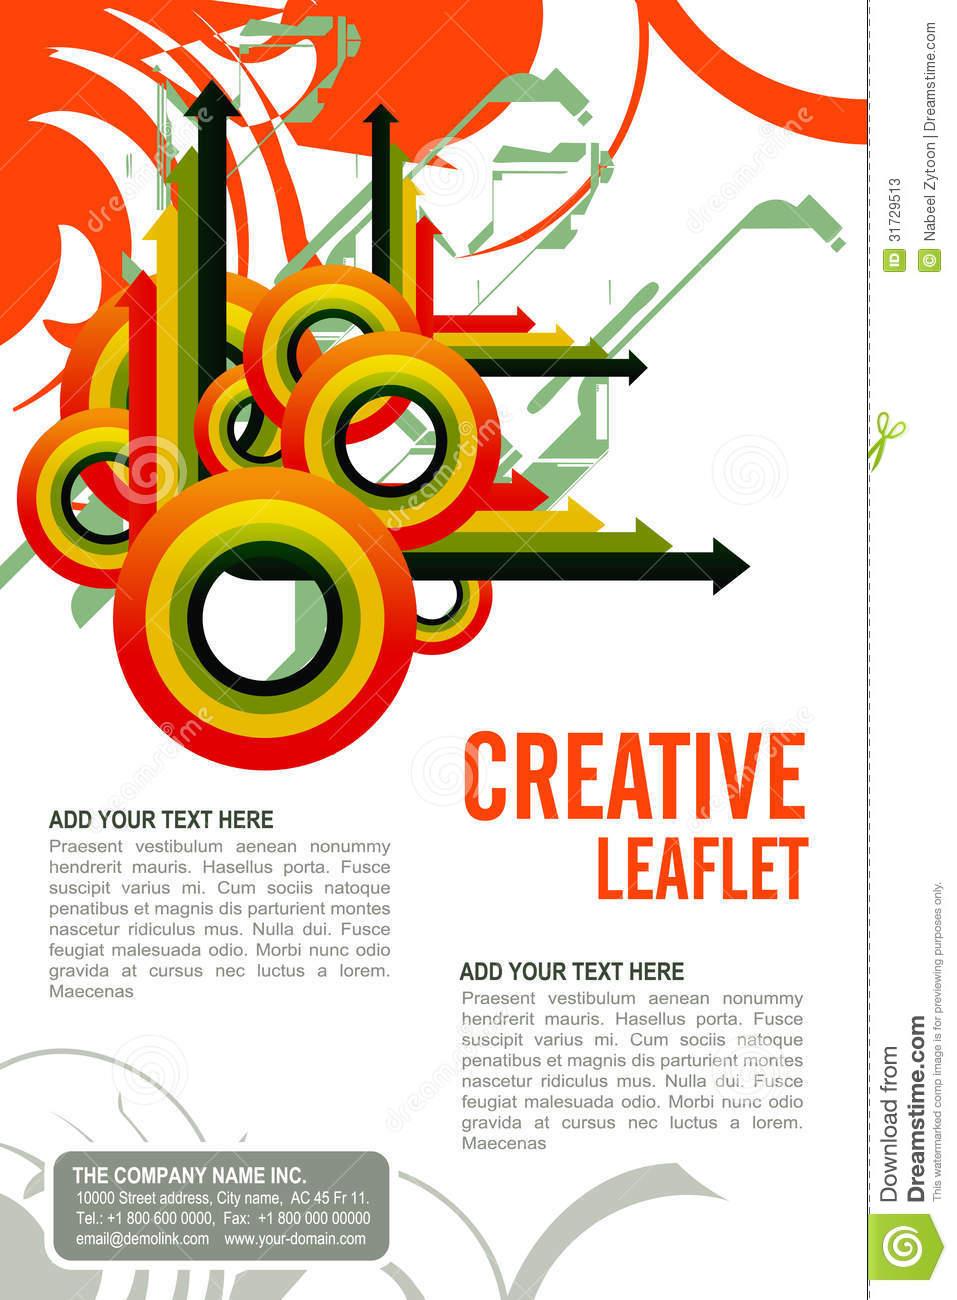 Leaflet Design Template Editable